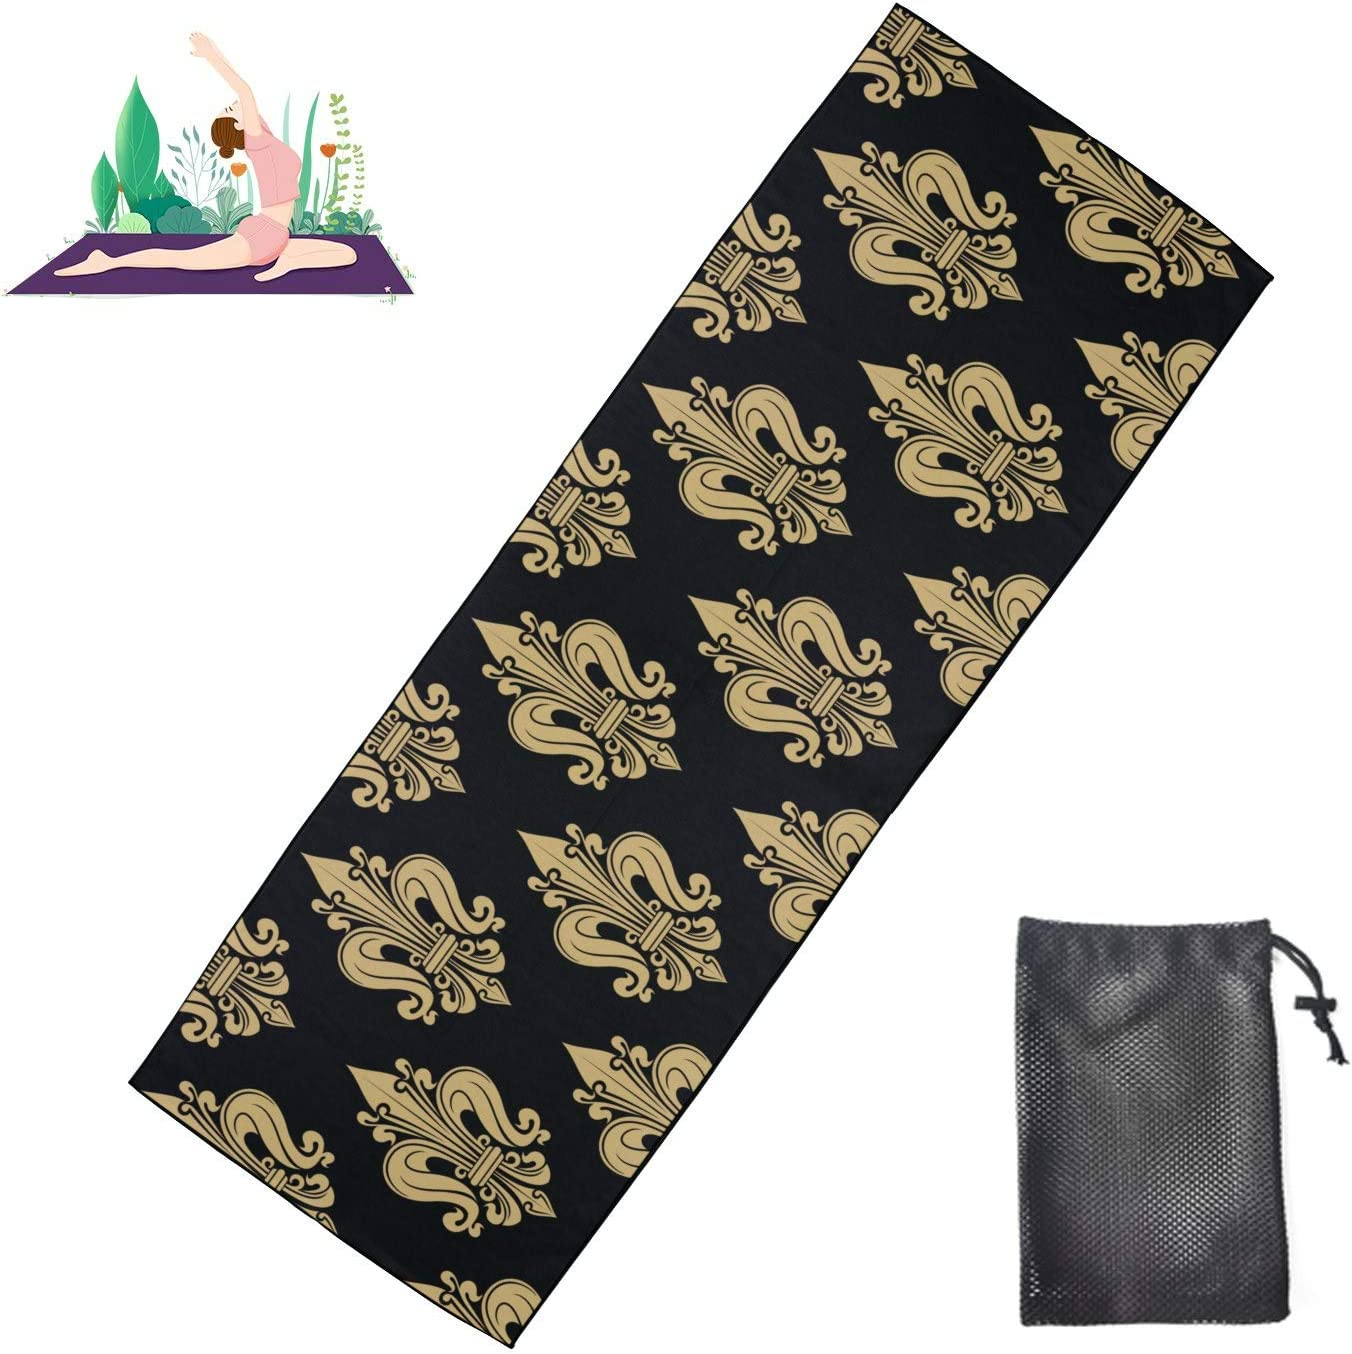 Printed Bargain Yoga Mat for Men French Omaha Mall Heraldic De Hot Fleur T Lis